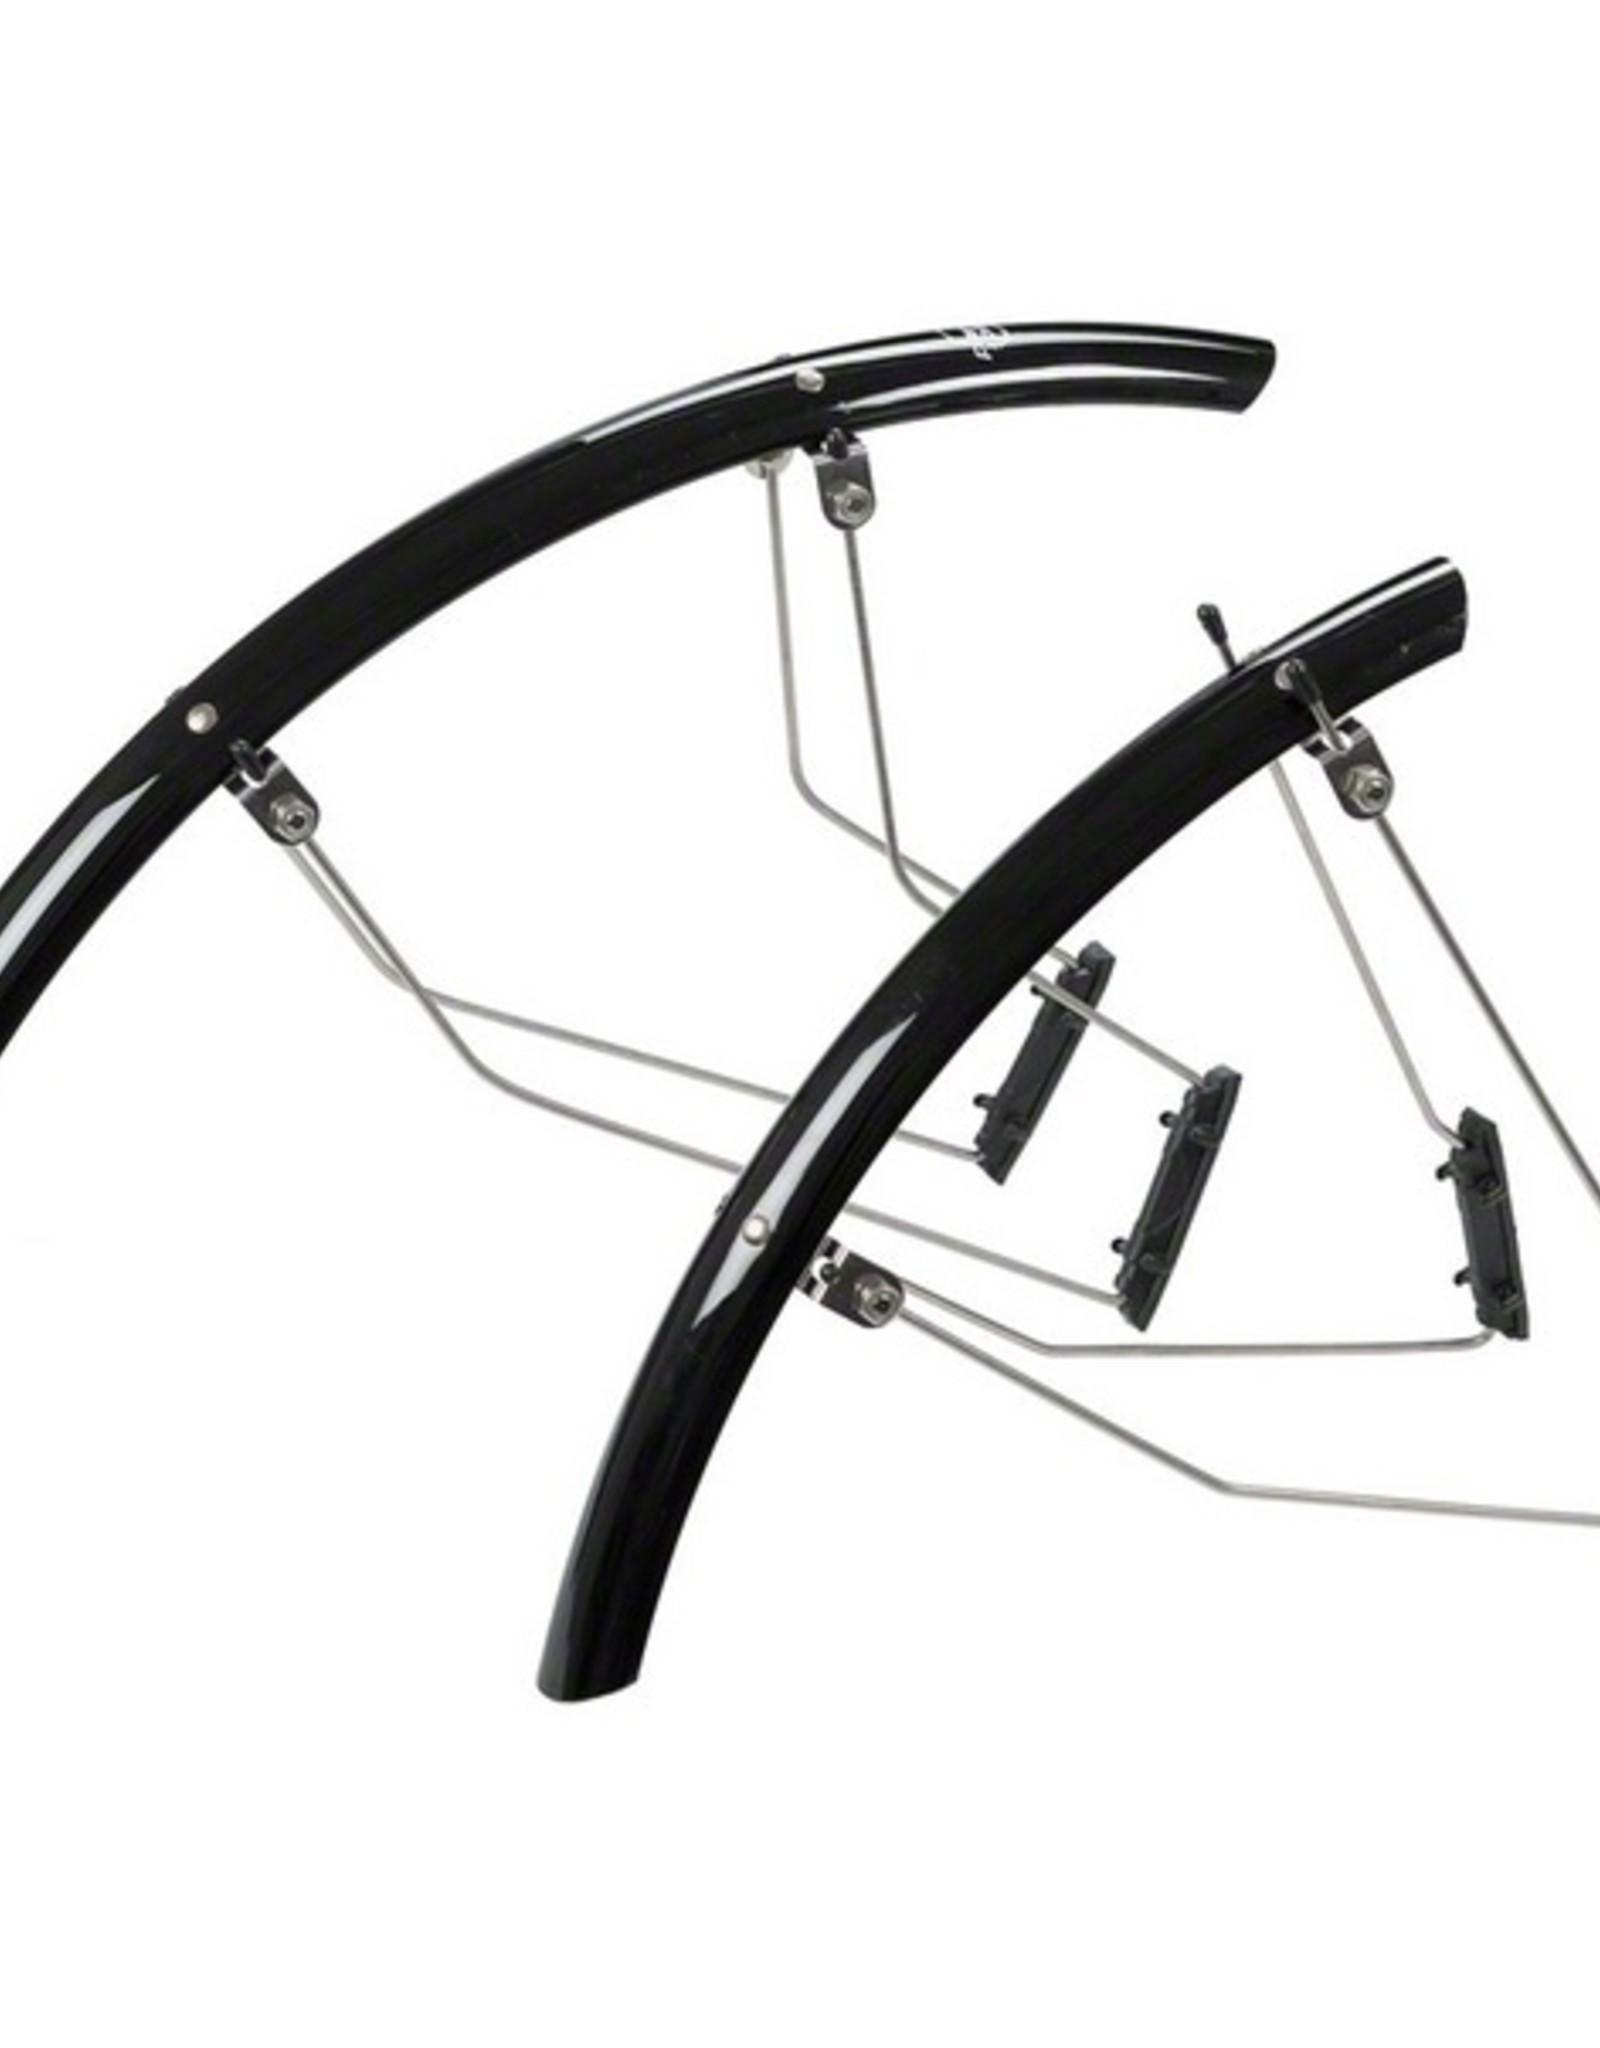 Planet Bike Planet Bike Speedez 700c x 35 Fender Set: Black (700c x 25)